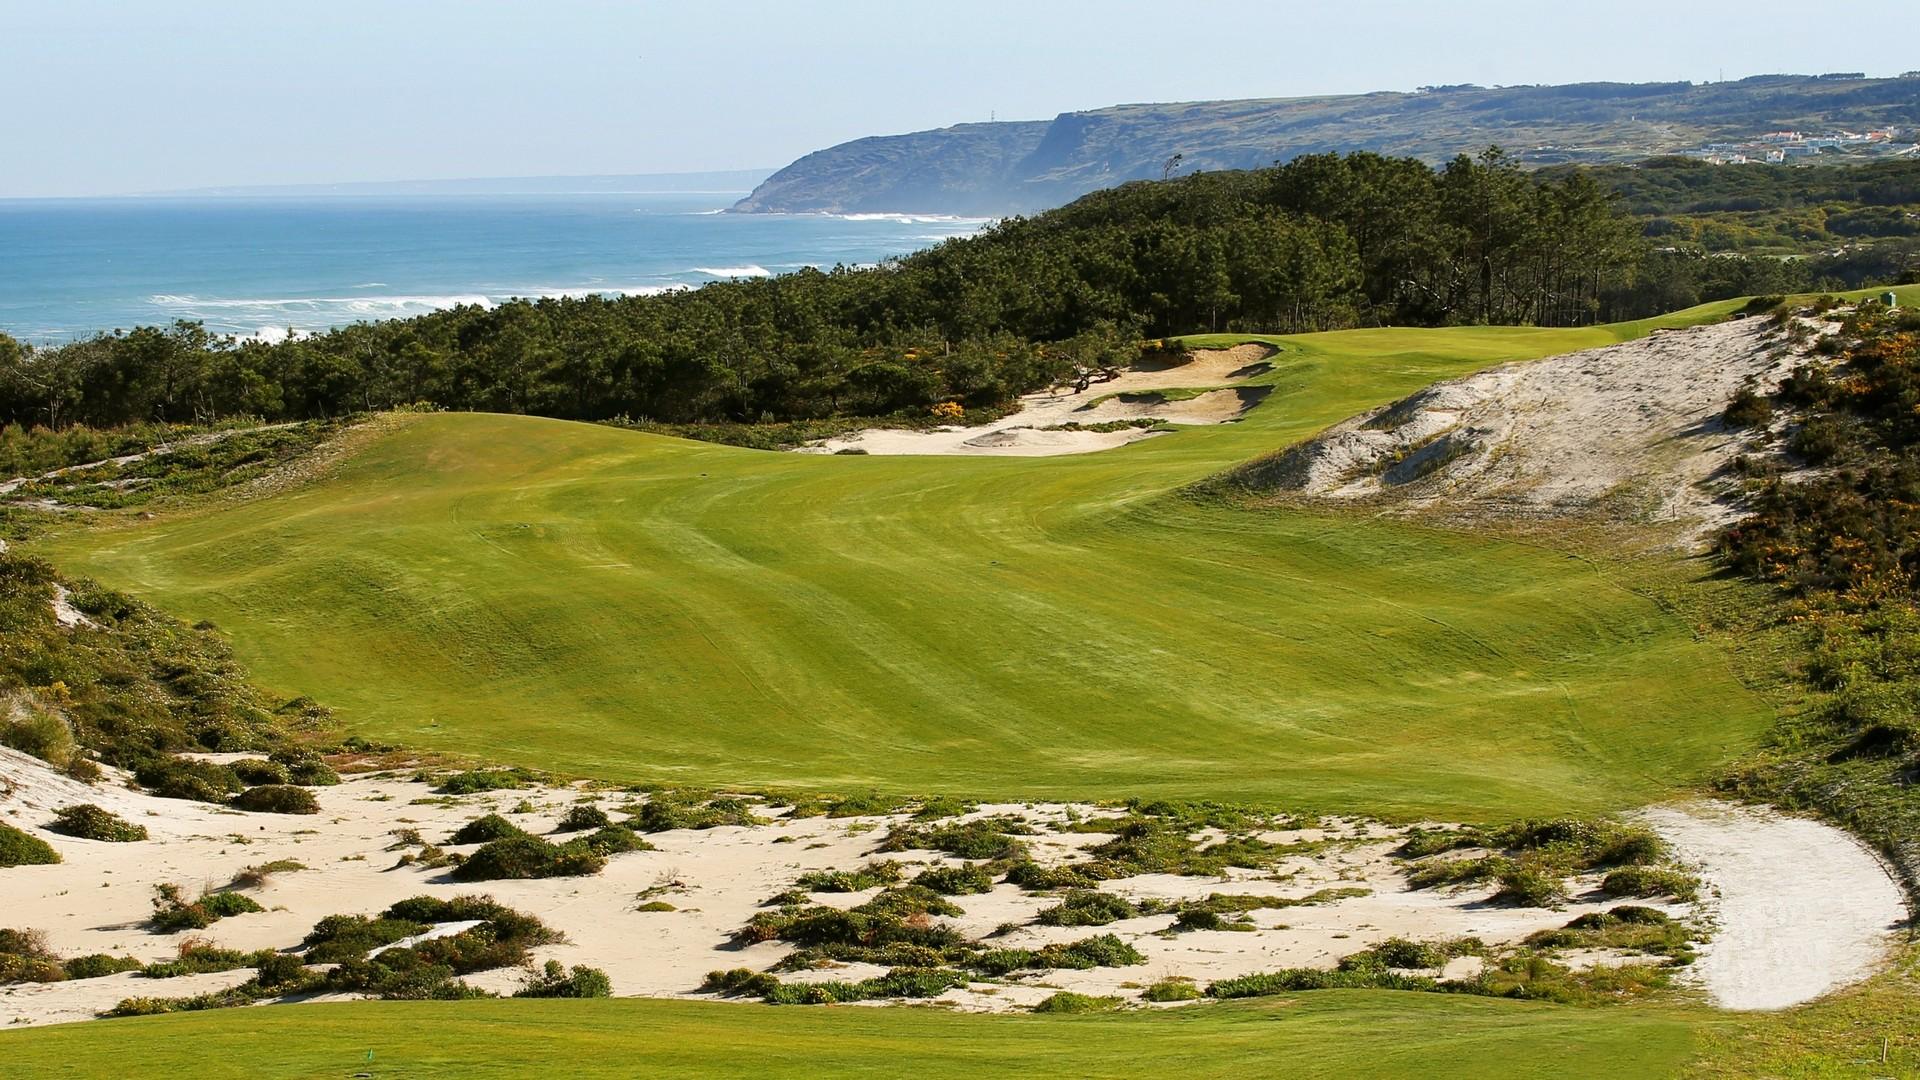 Portuguese golf clubs 8 portuguese golf clubs Portuguese golf clubs: The perfect place for you to relax Portuguese golf clubs 8